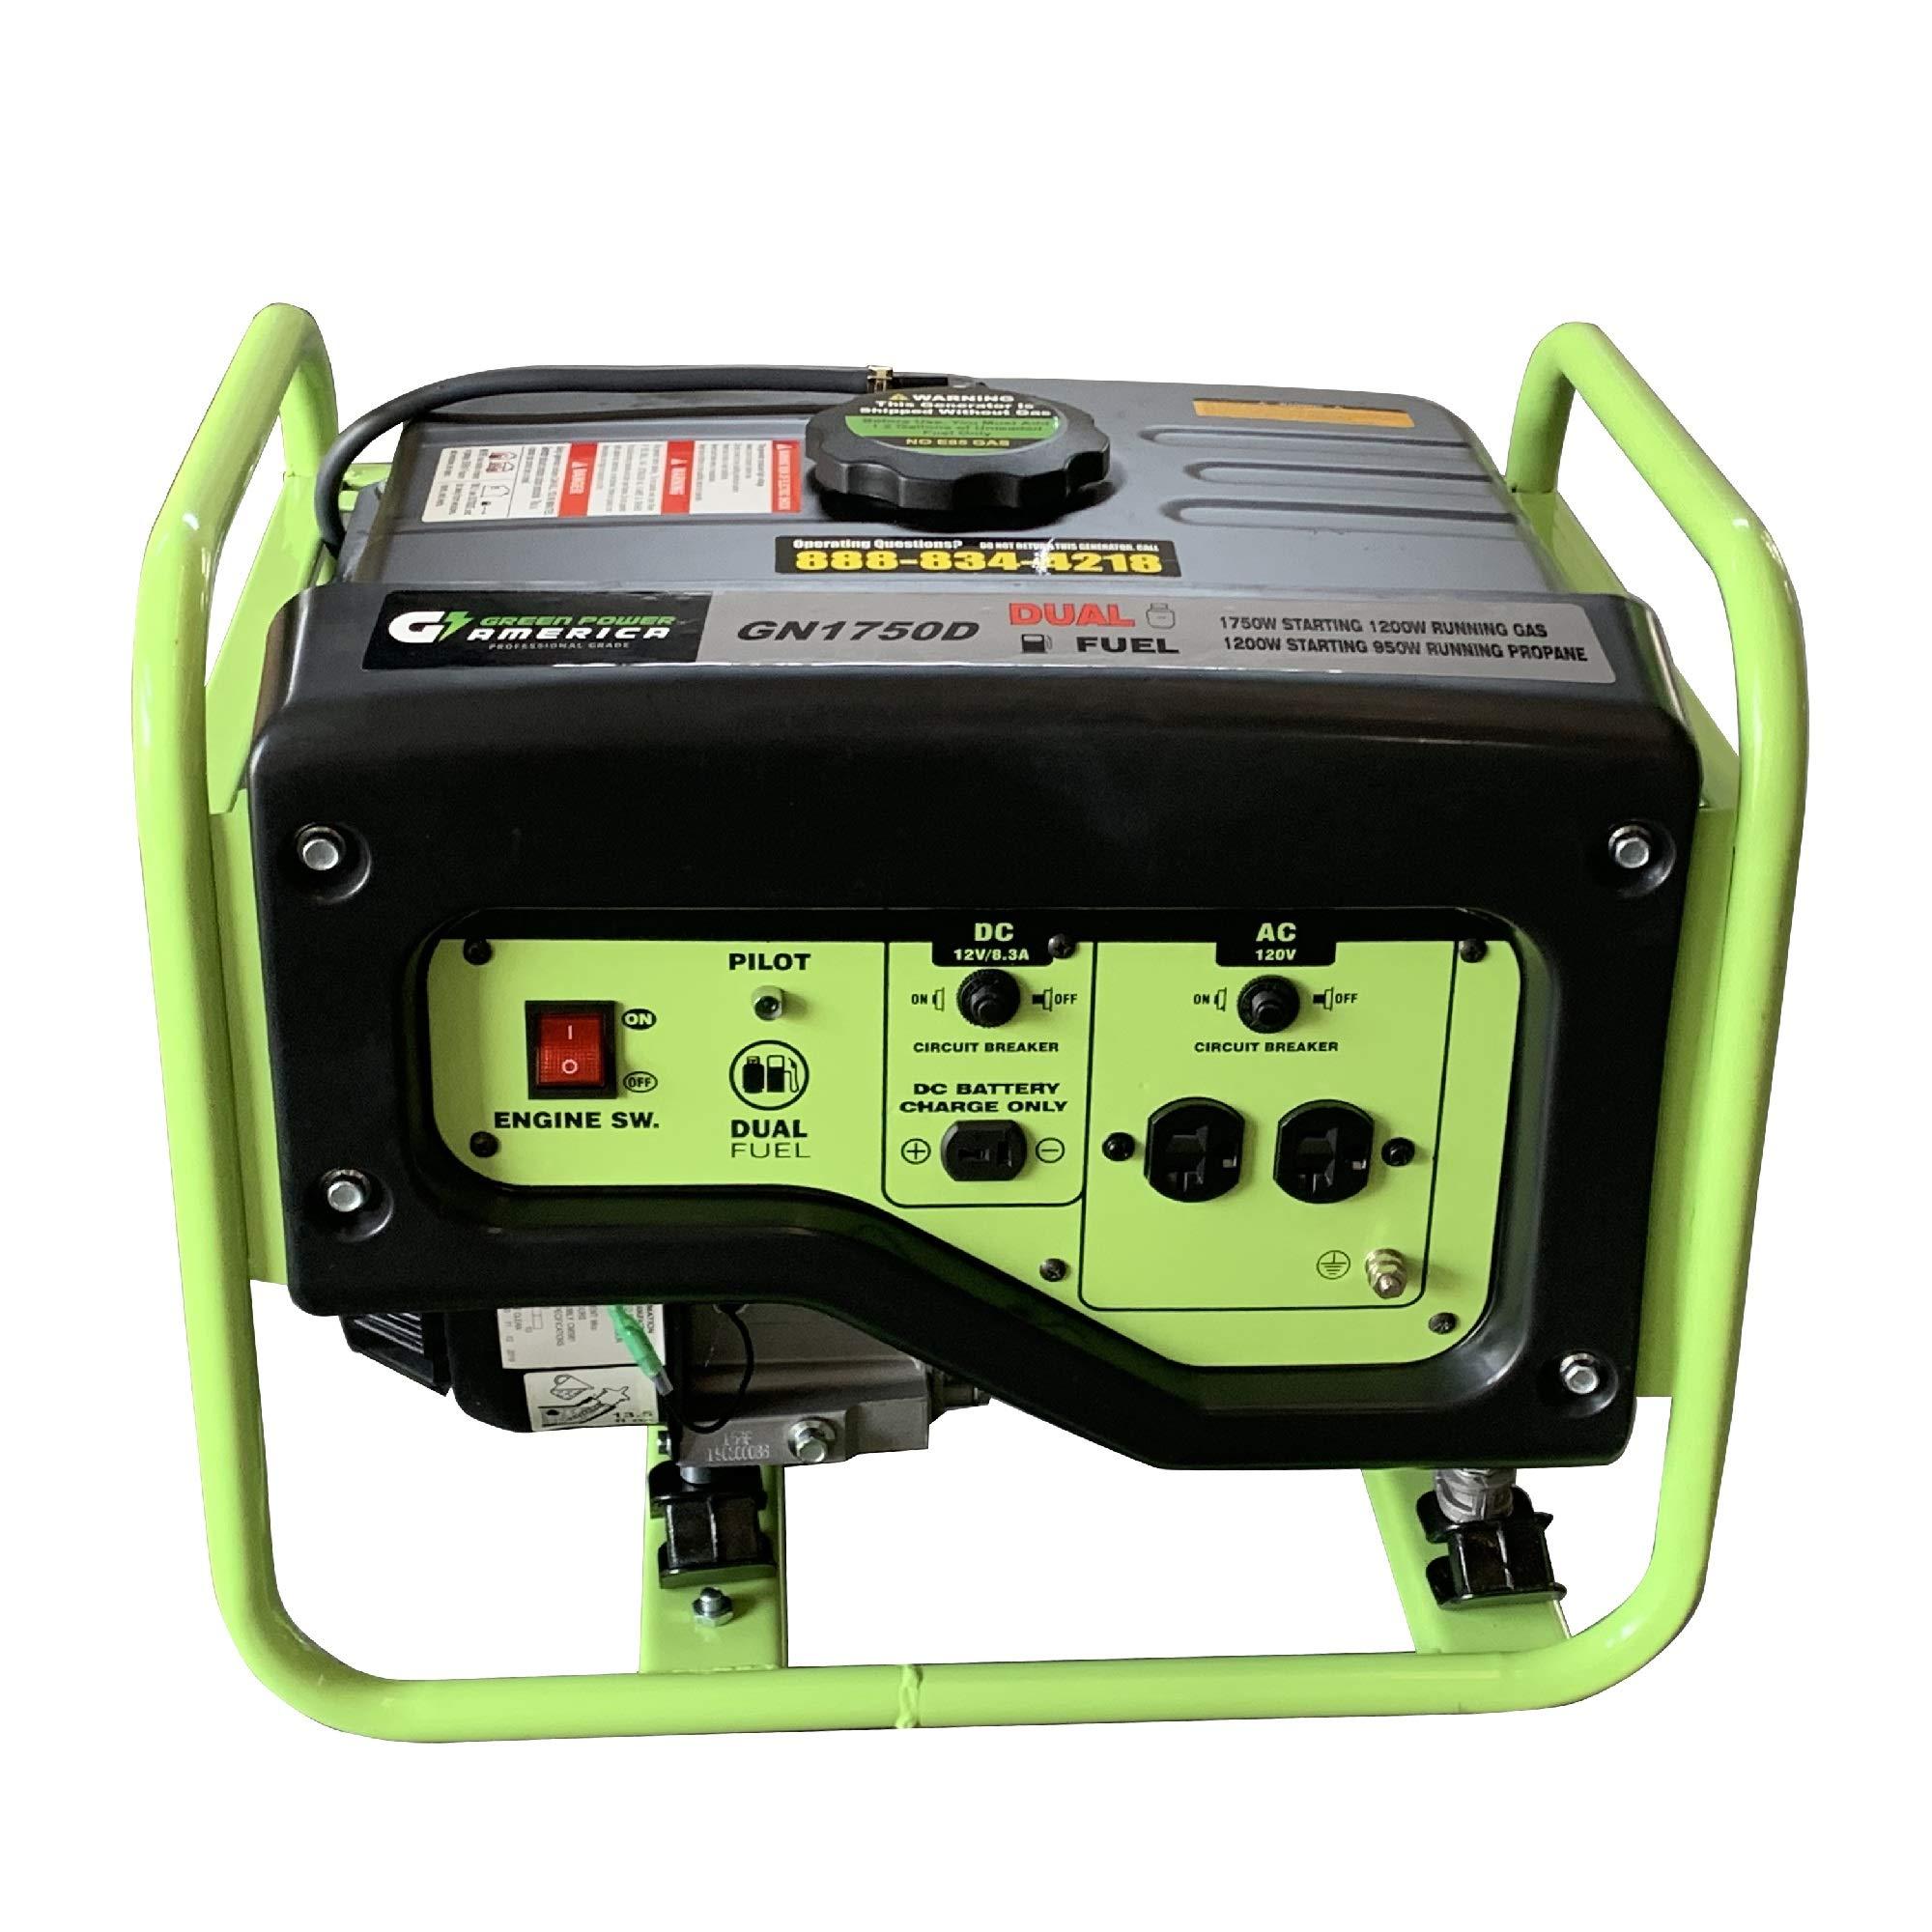 Green-Power America GN1750D 1750-Watt Propane and Gasoline Powered Dual Fuel Generator, Green by Green-Power America